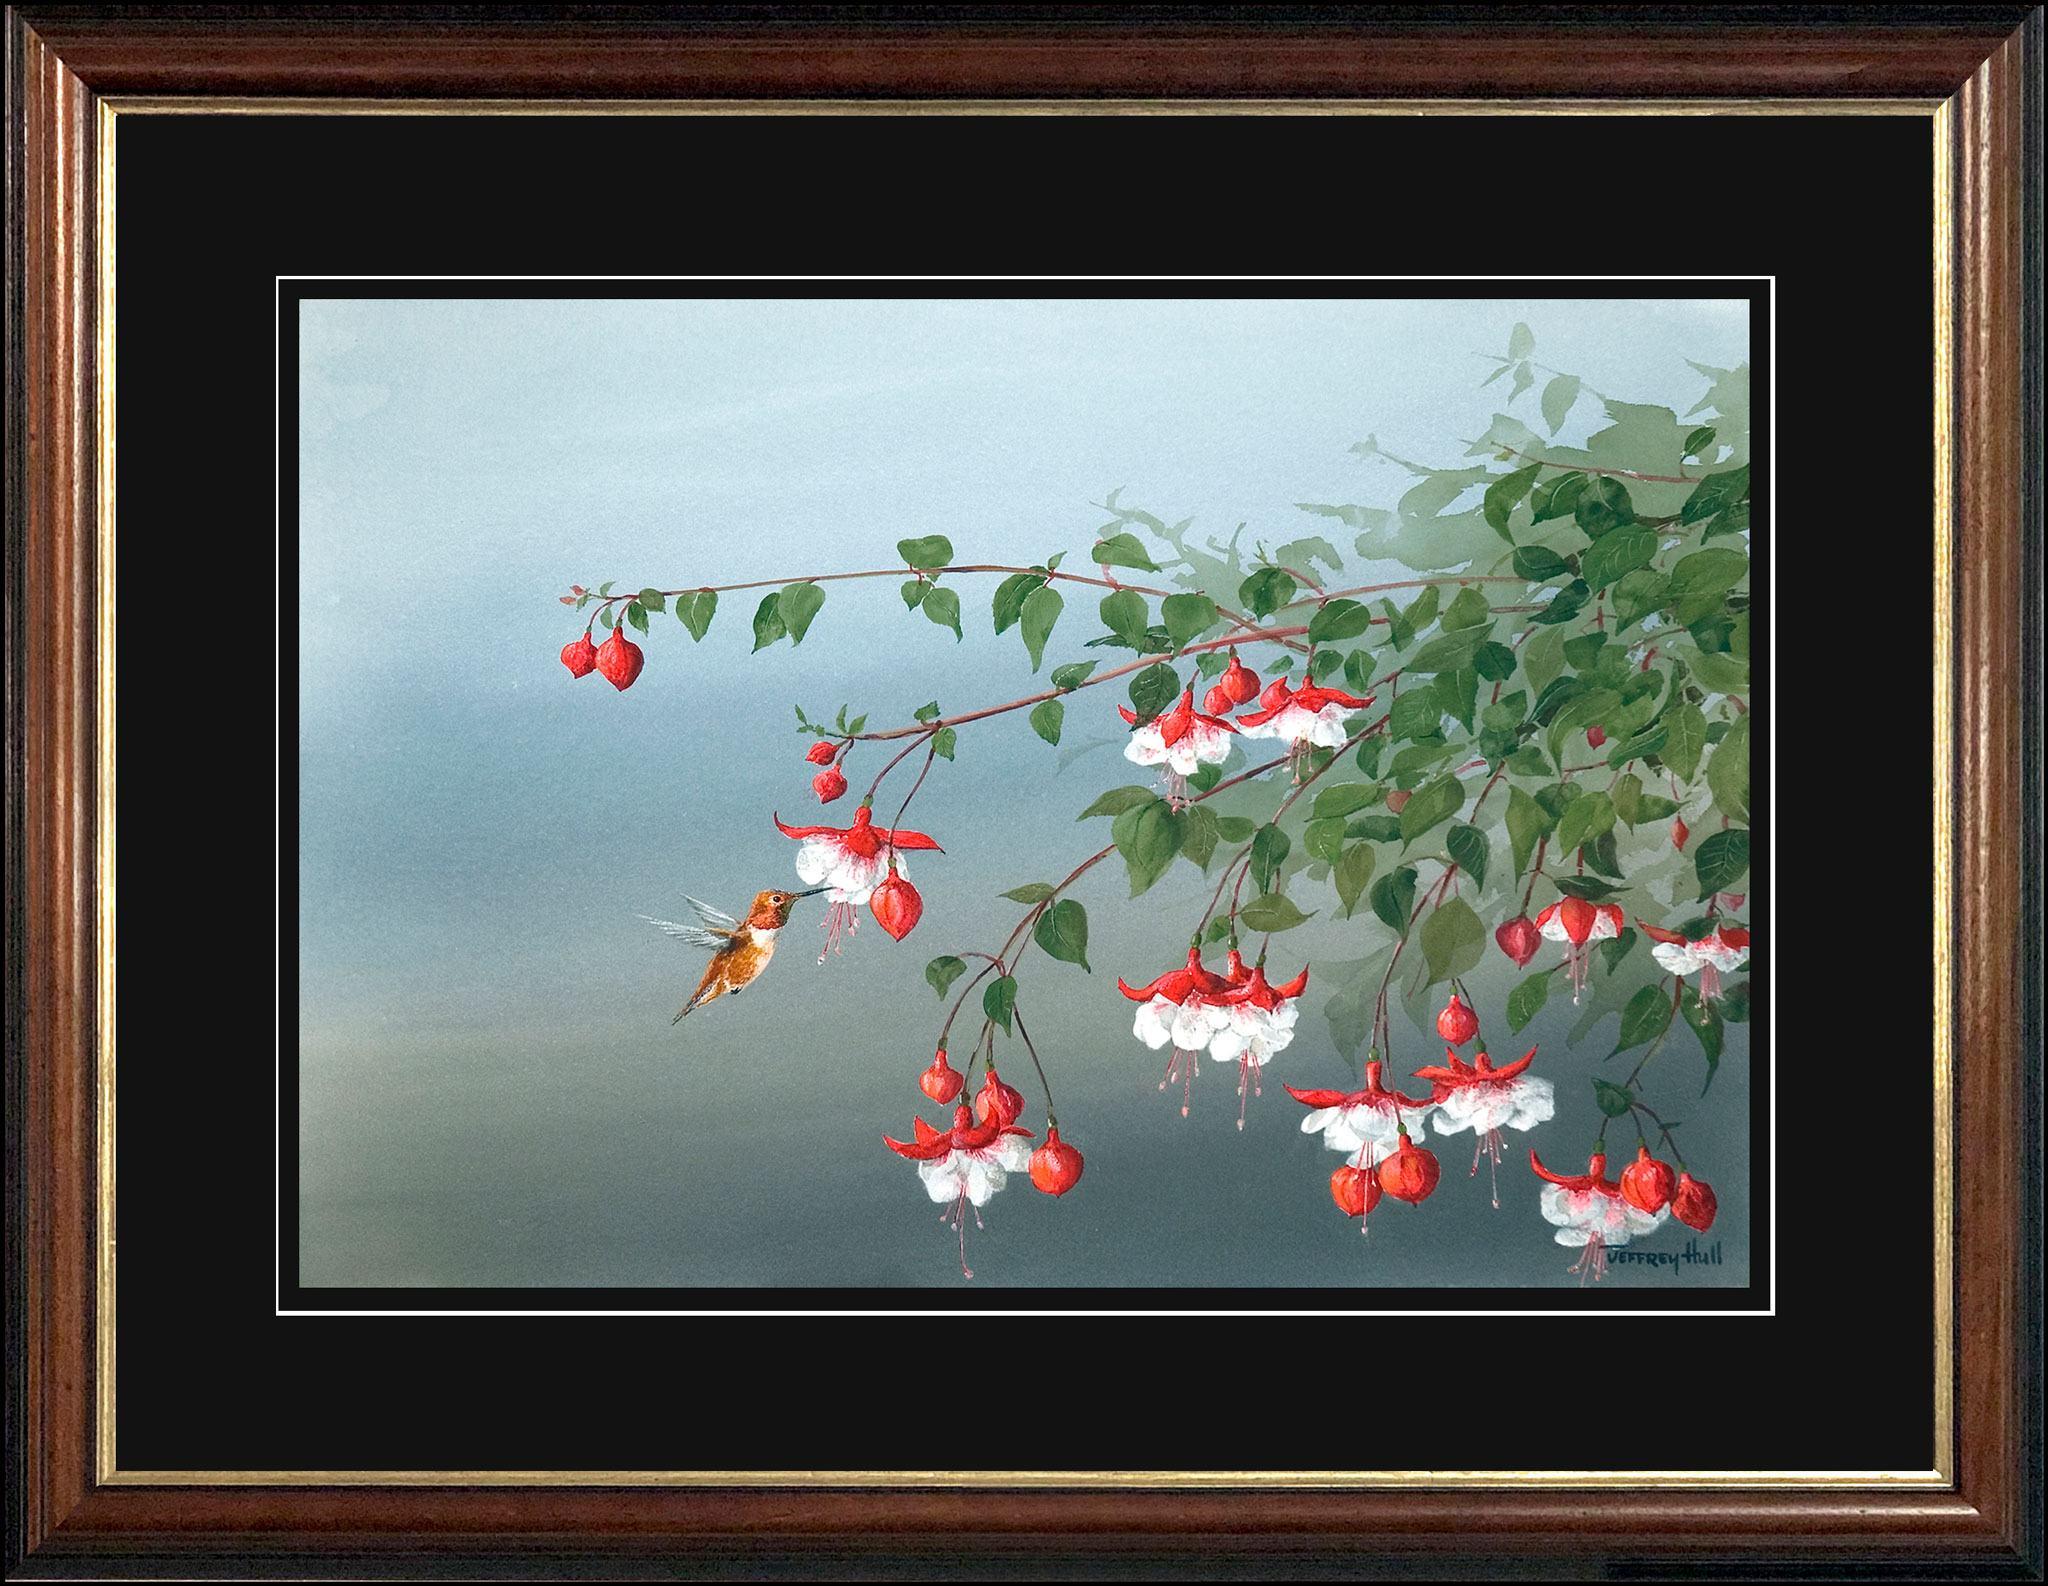 Fuchsia-Blossoms-LimEd-Malabar-Jet-Black-4-Website-2021